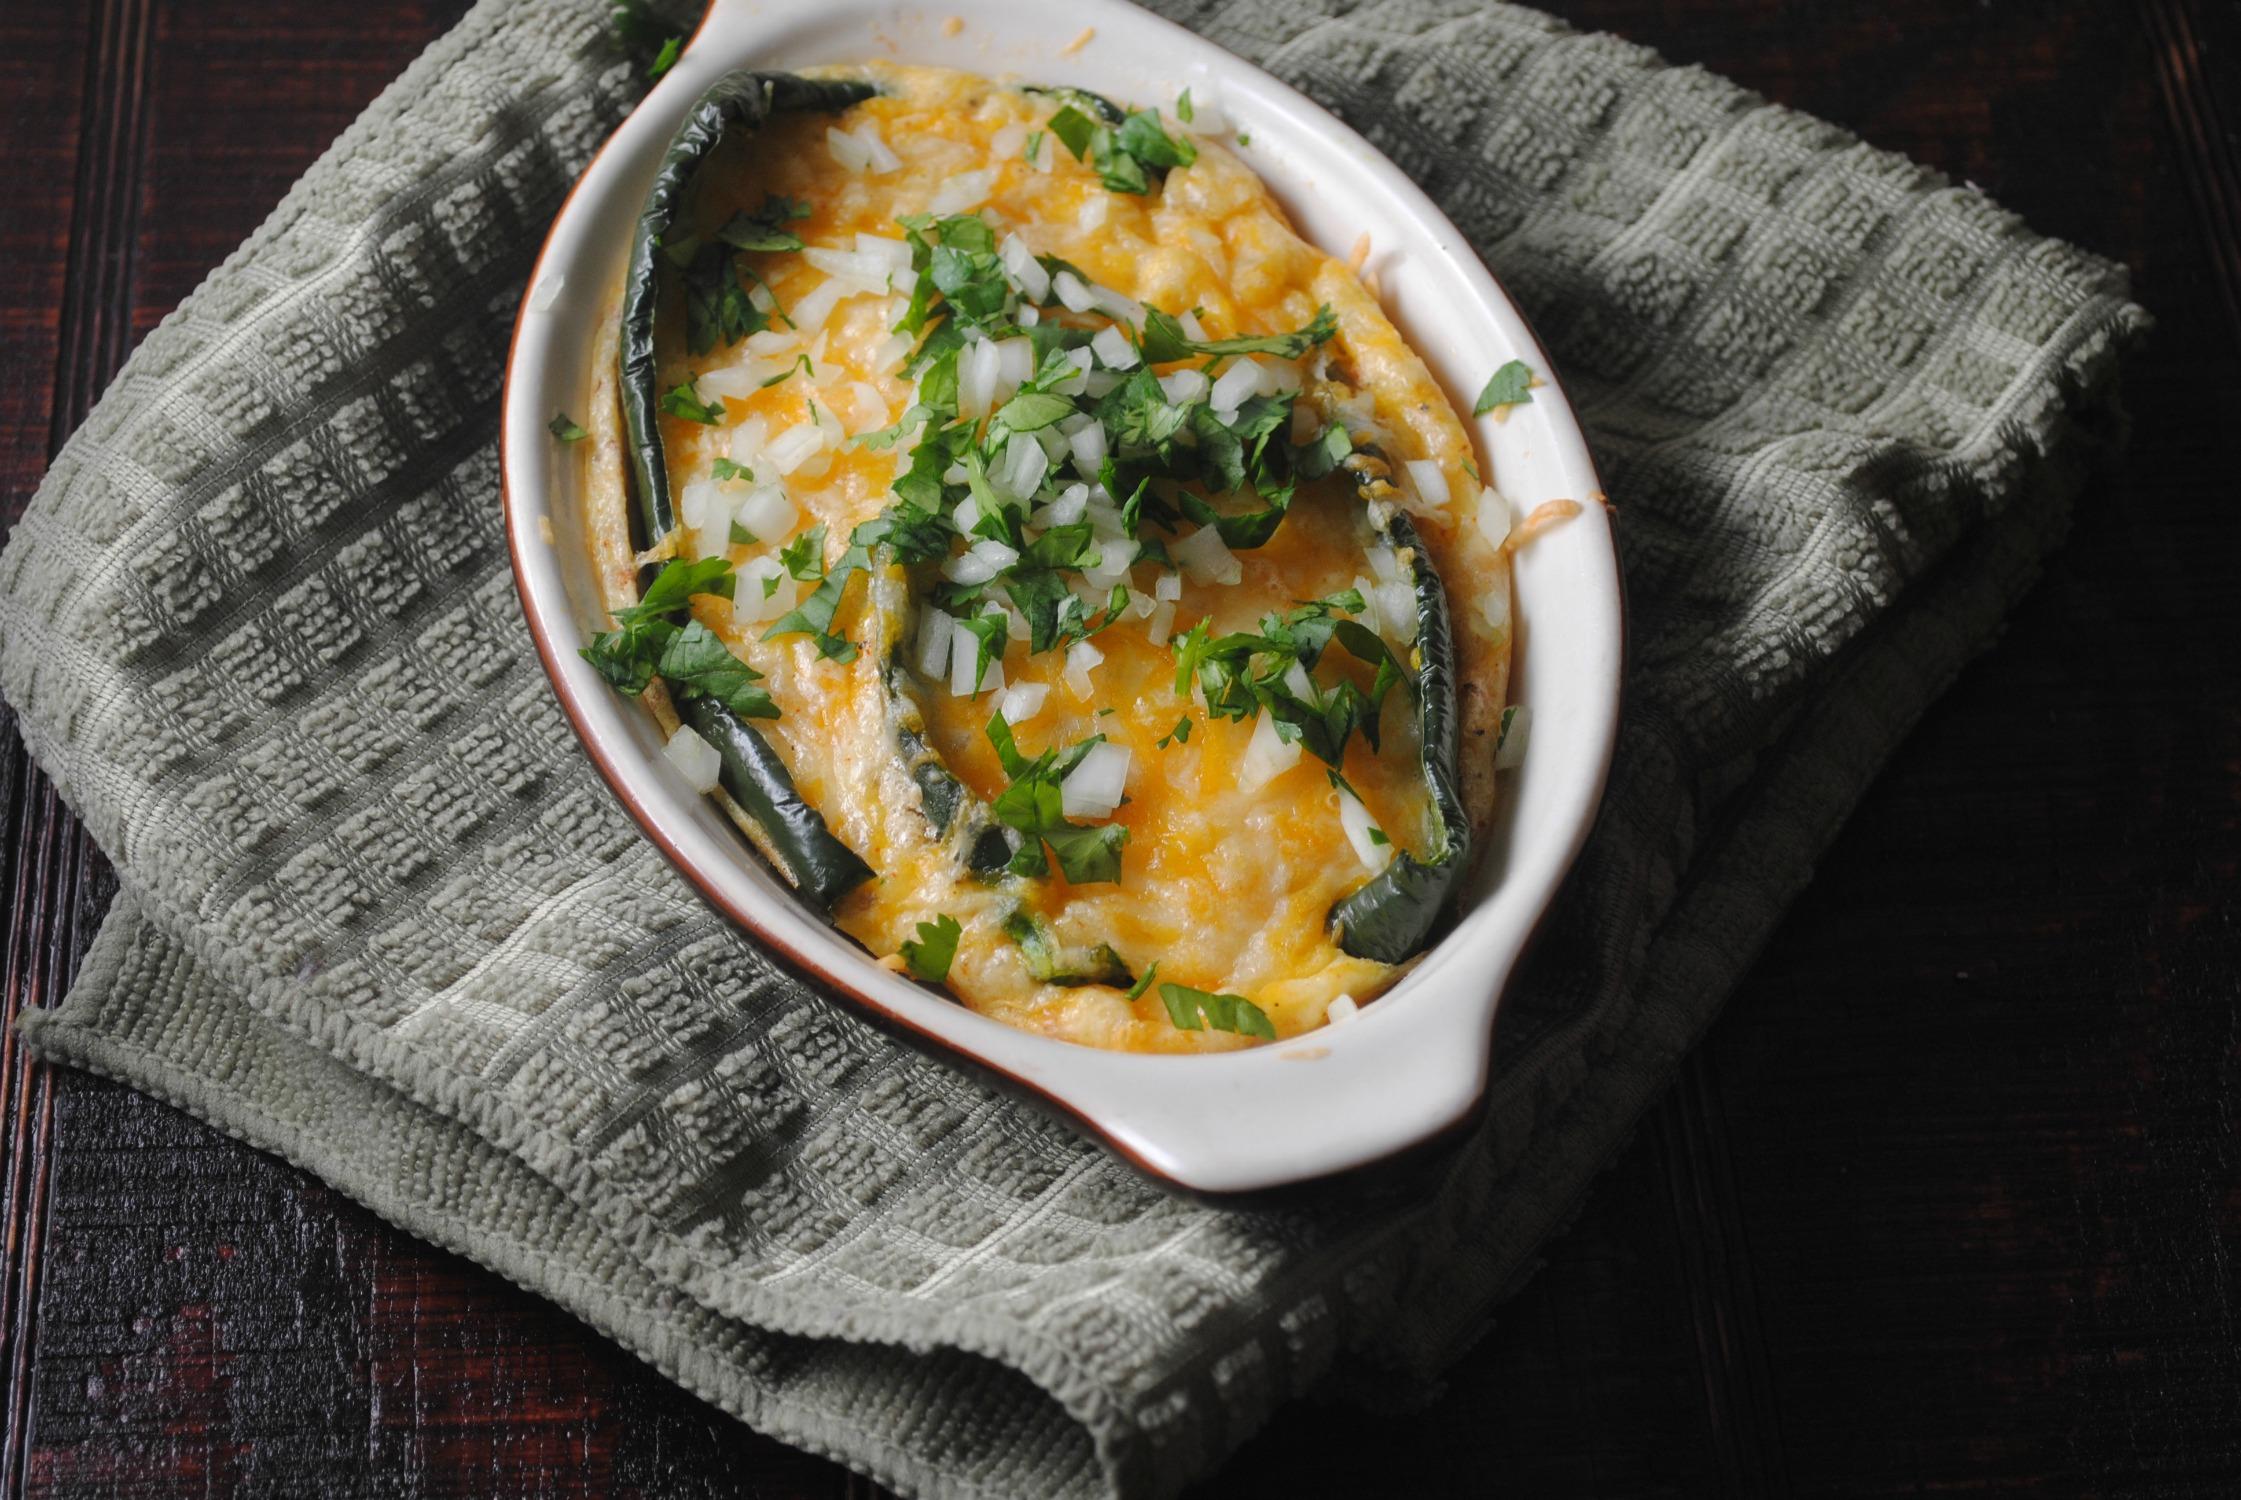 baked-chile-rellenos-VianneyRodriguez-sweetlifebake